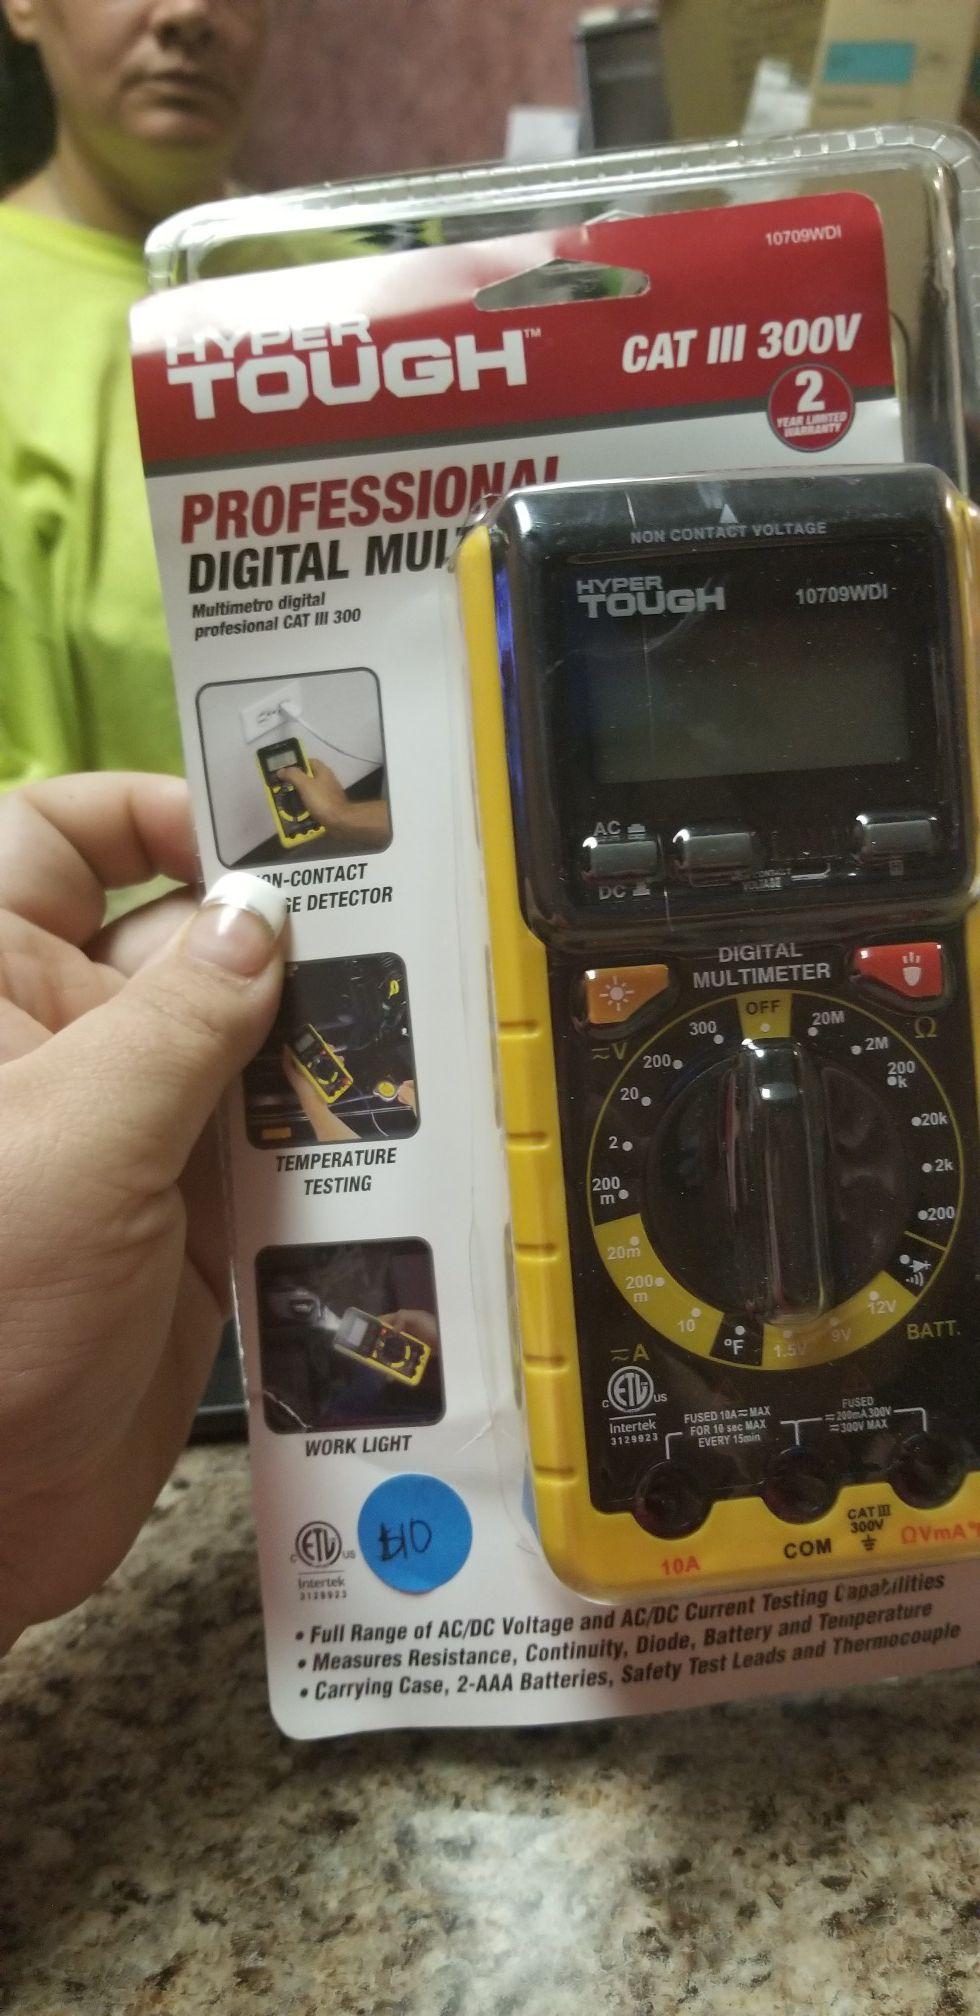 Hyper tough professional digital multimeter